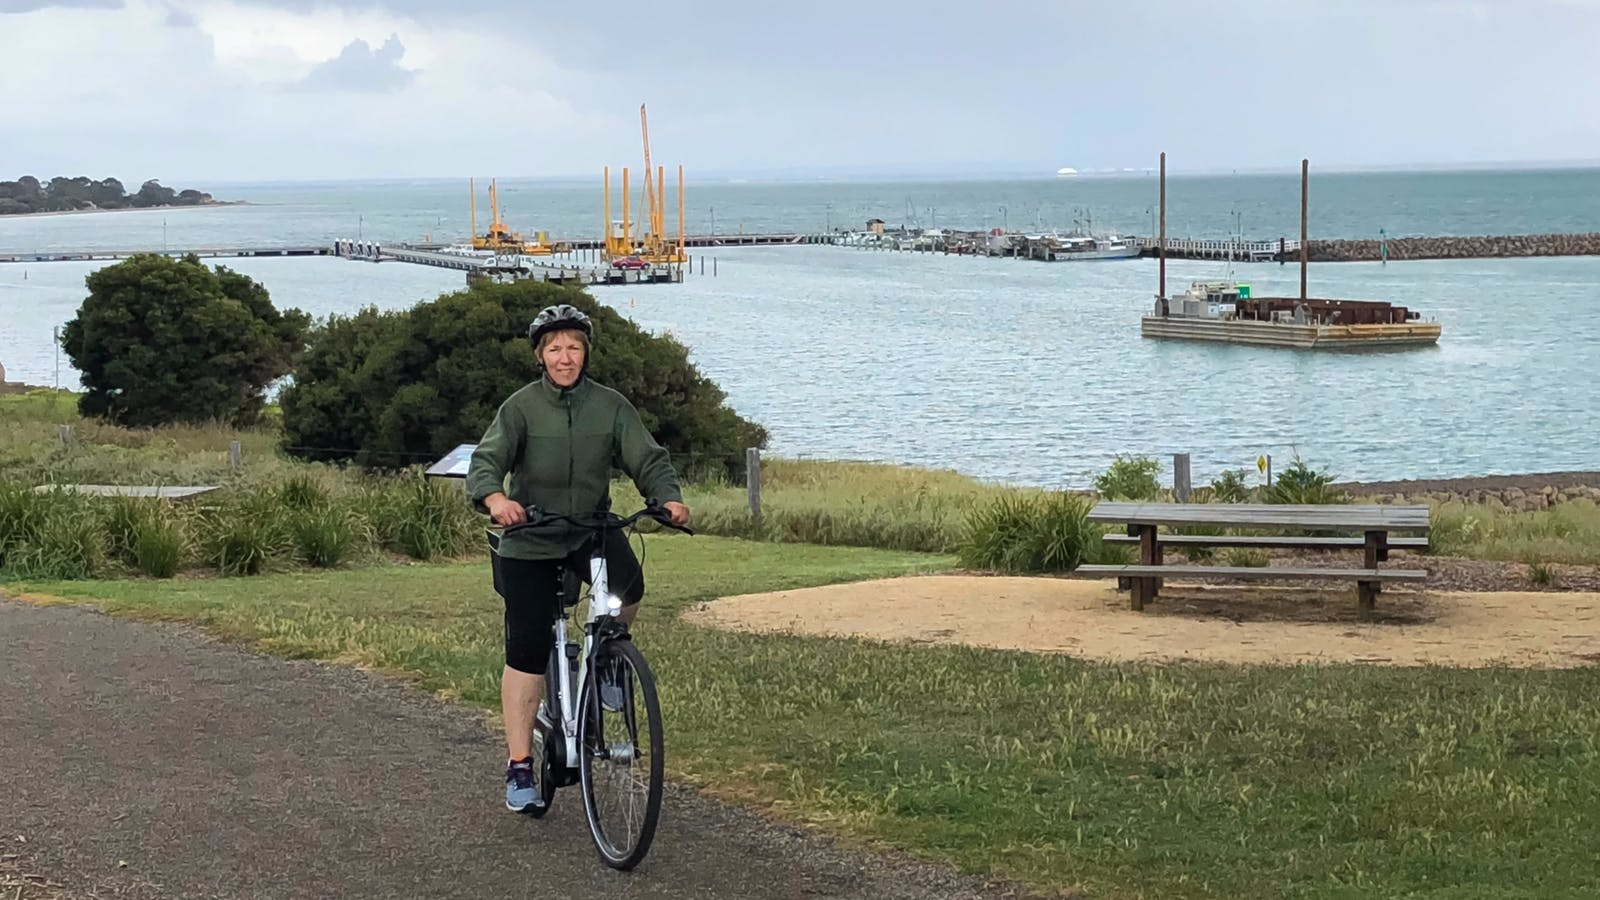 Portarlington Pier from the Esplanade bike path